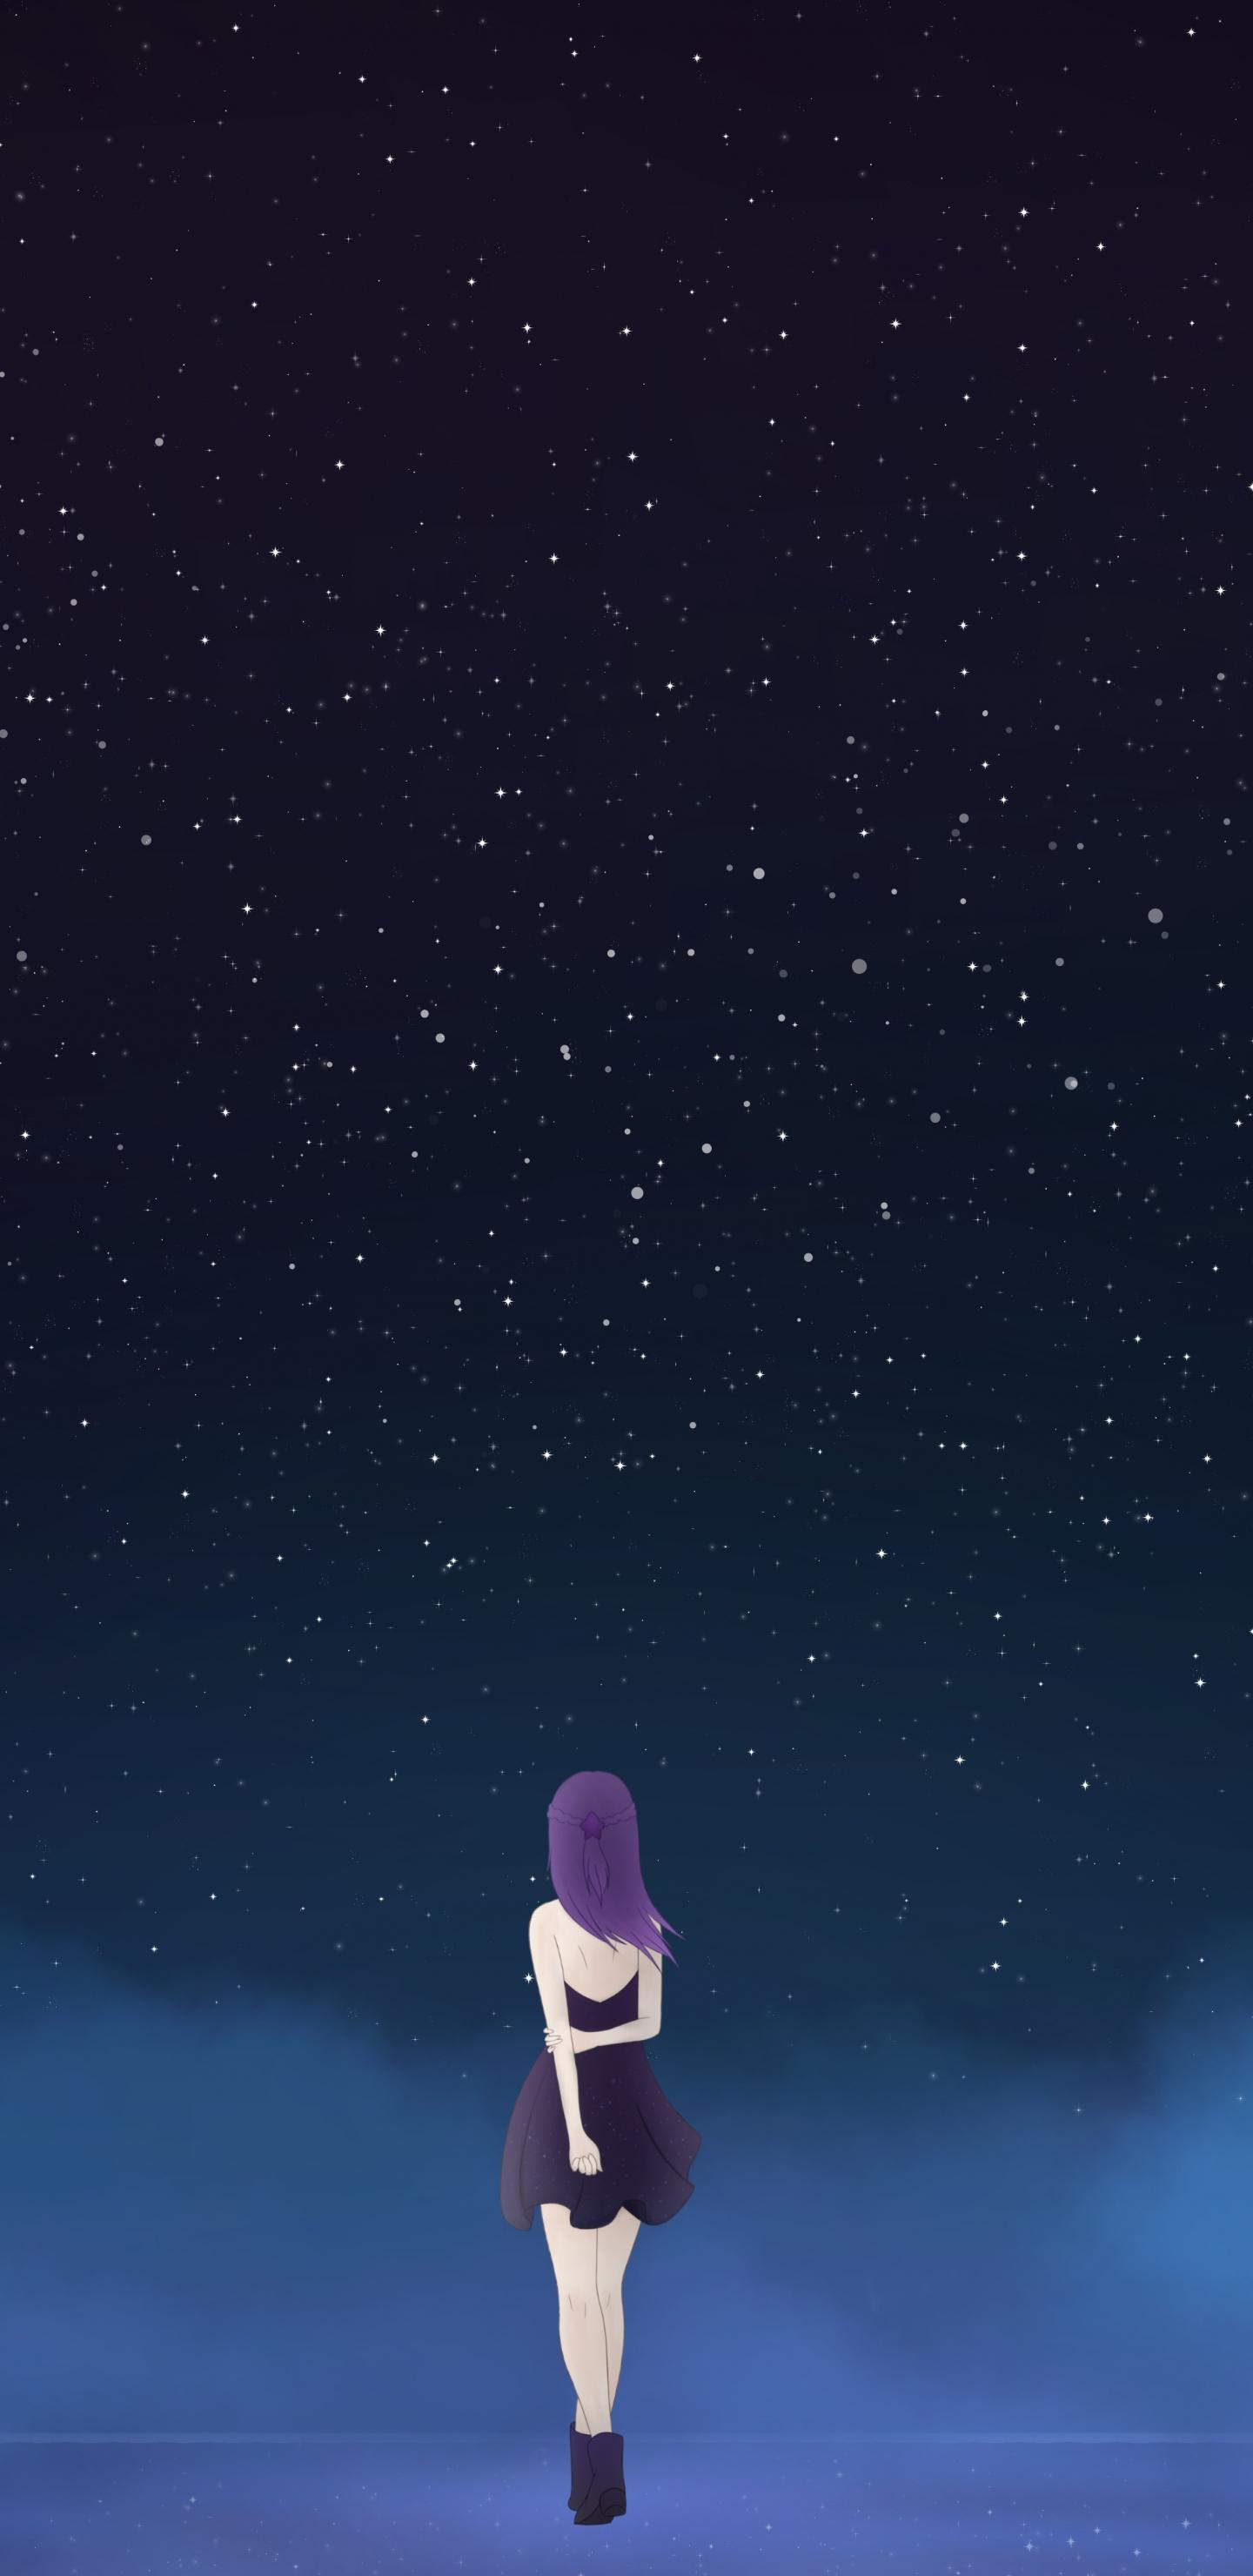 Anime Galaxy Background Materi Pelajaran 6